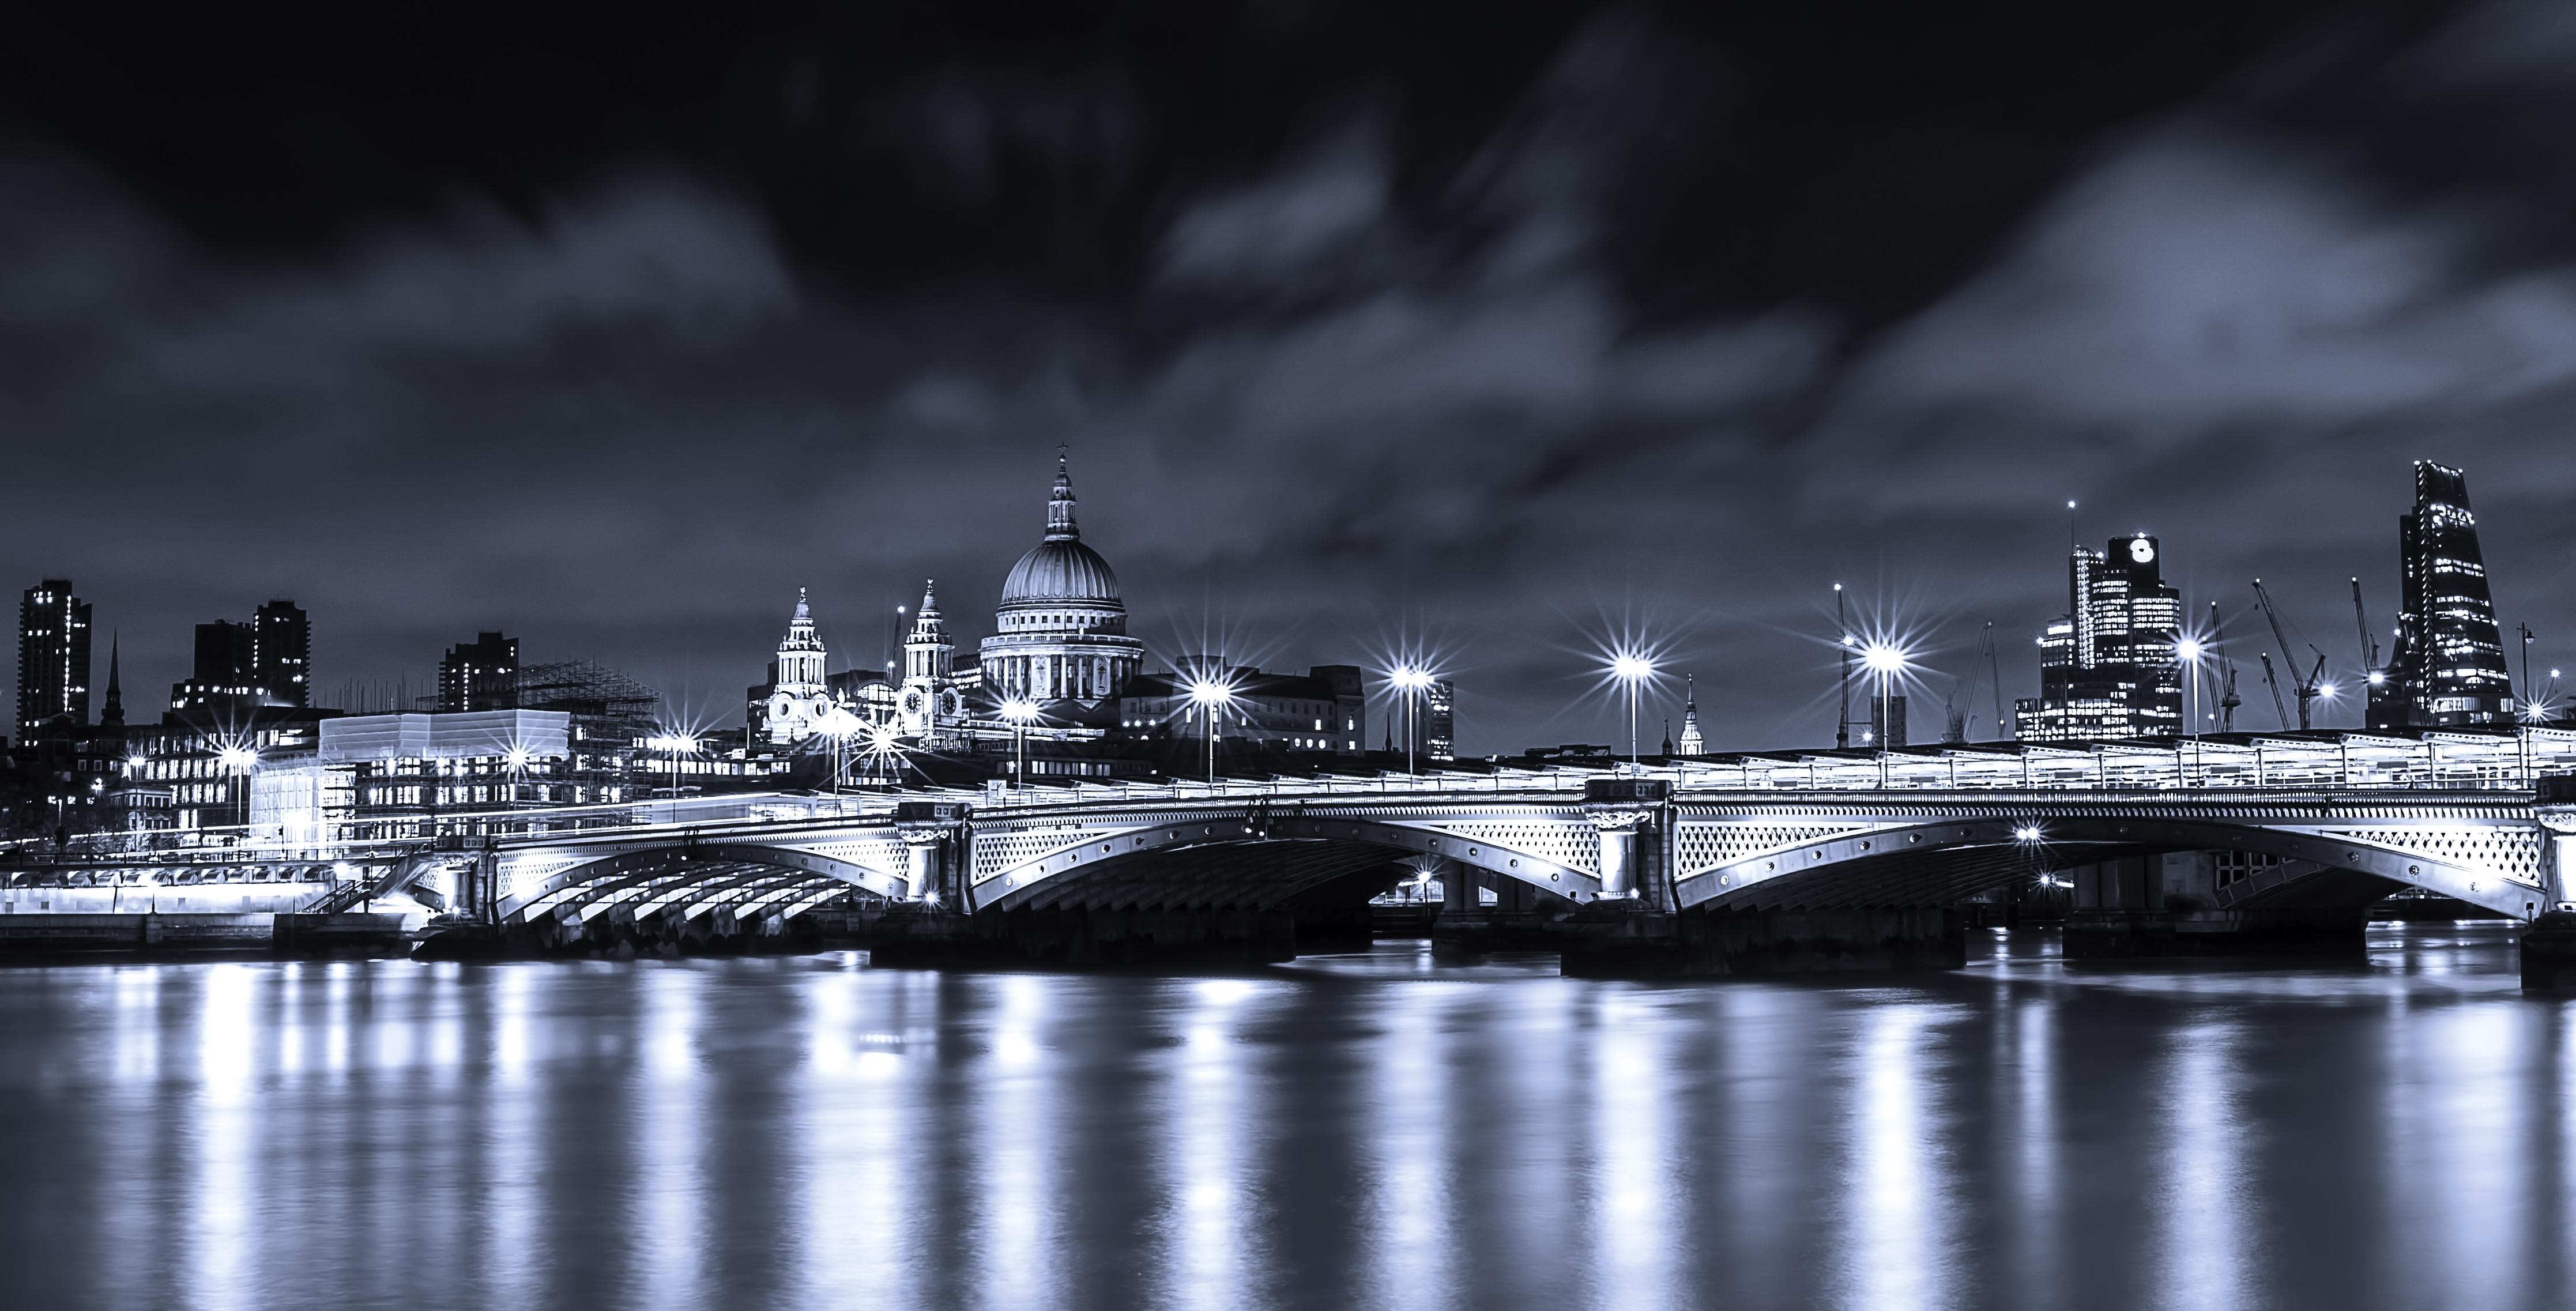 London Night (1 of 1)